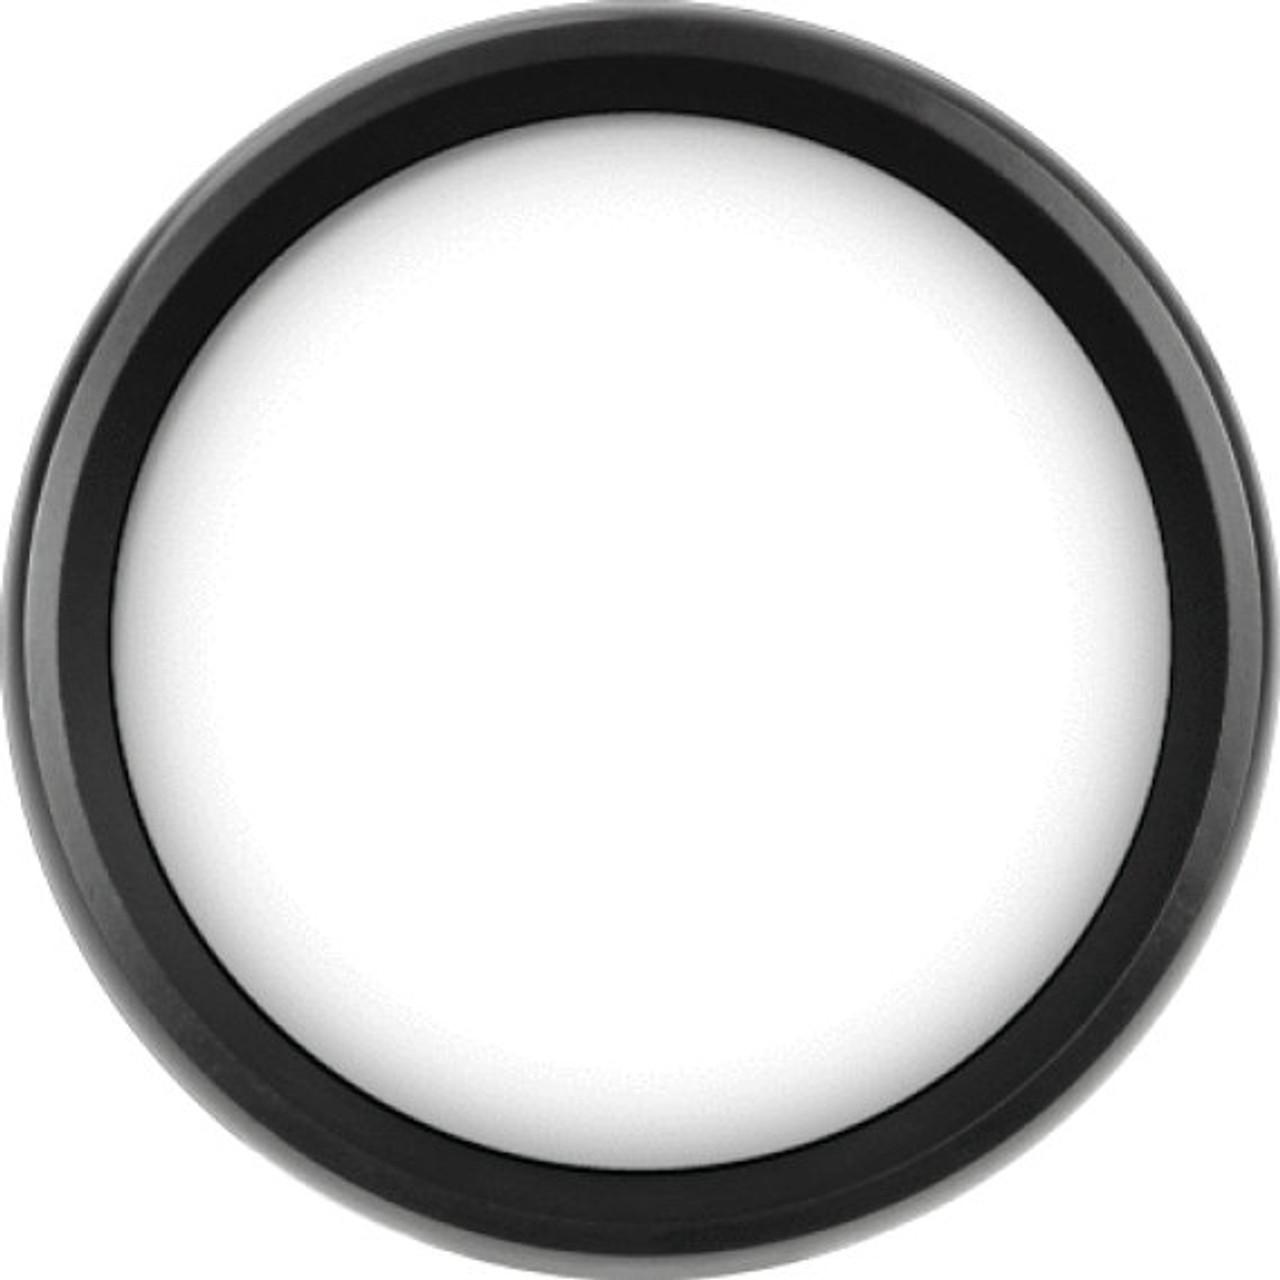 "Revolution Black Replacement Bezel for 3-3/8"" gauge"